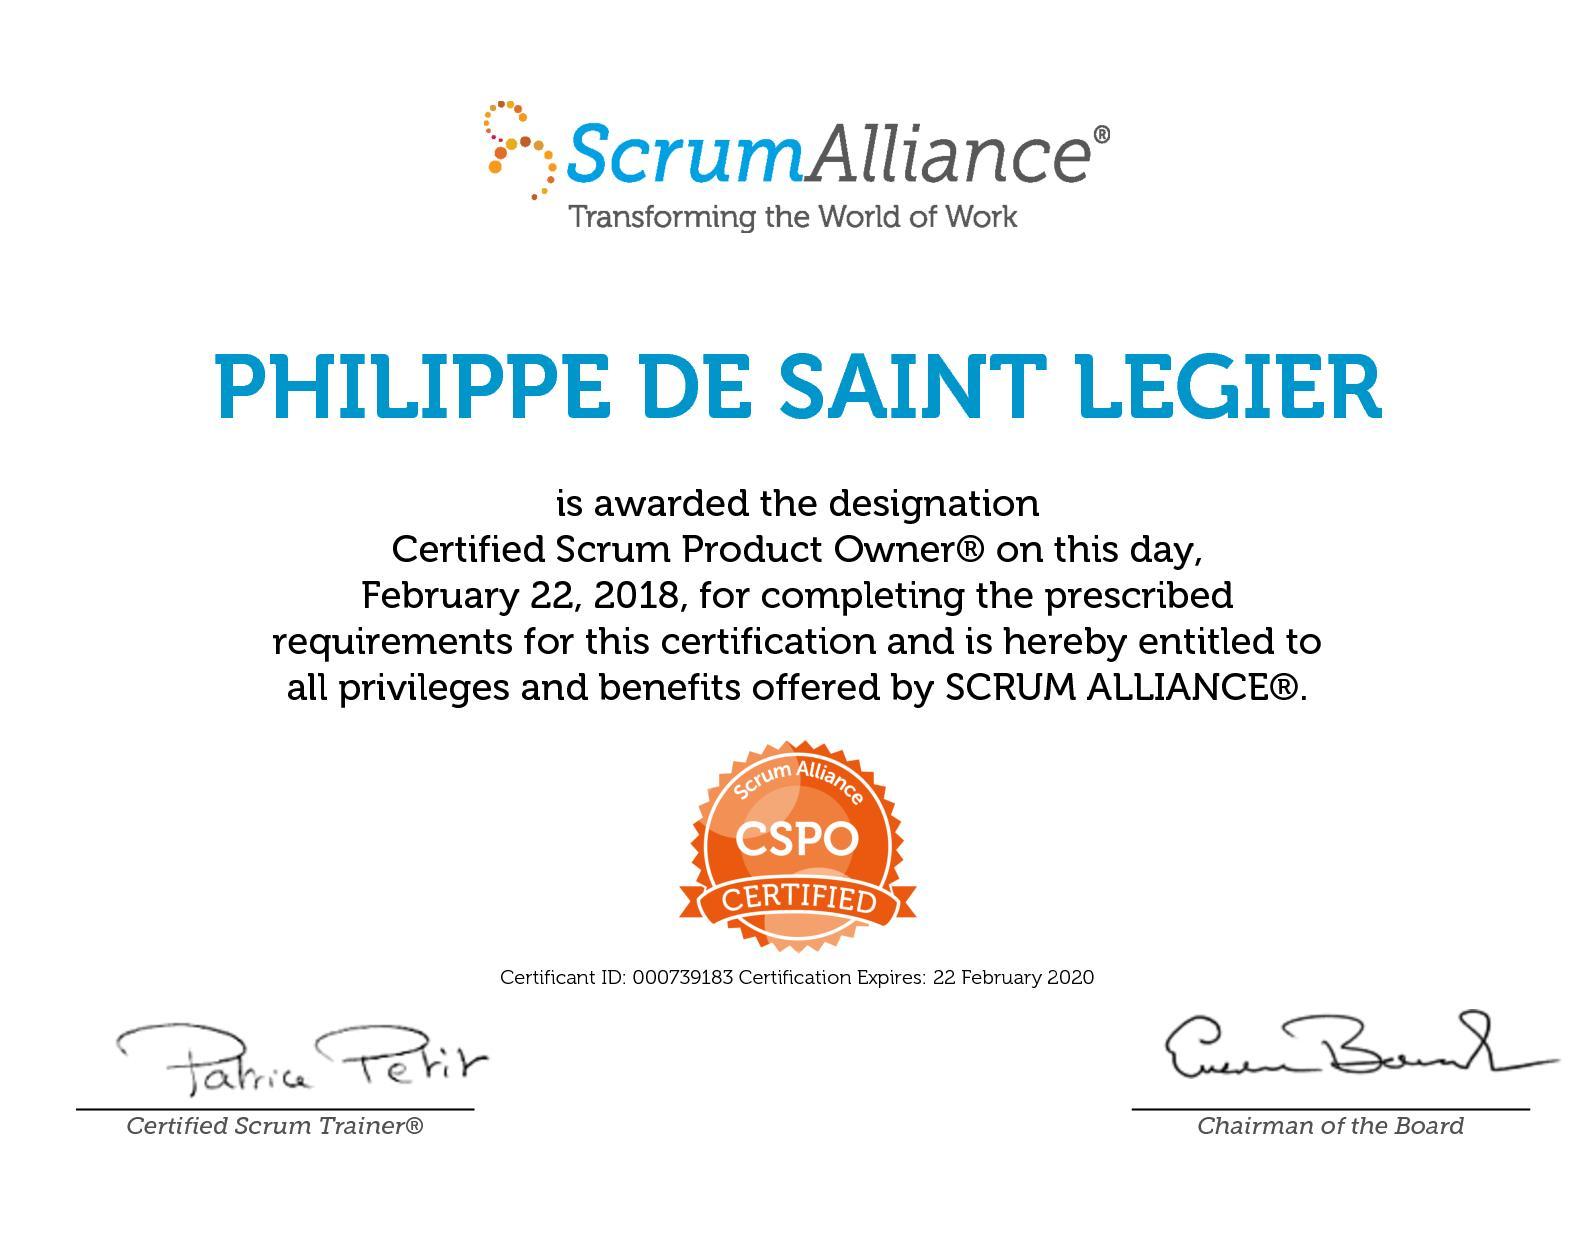 Calamo Philippe De Saint Legier Scrum Alliance Cspo Certificate